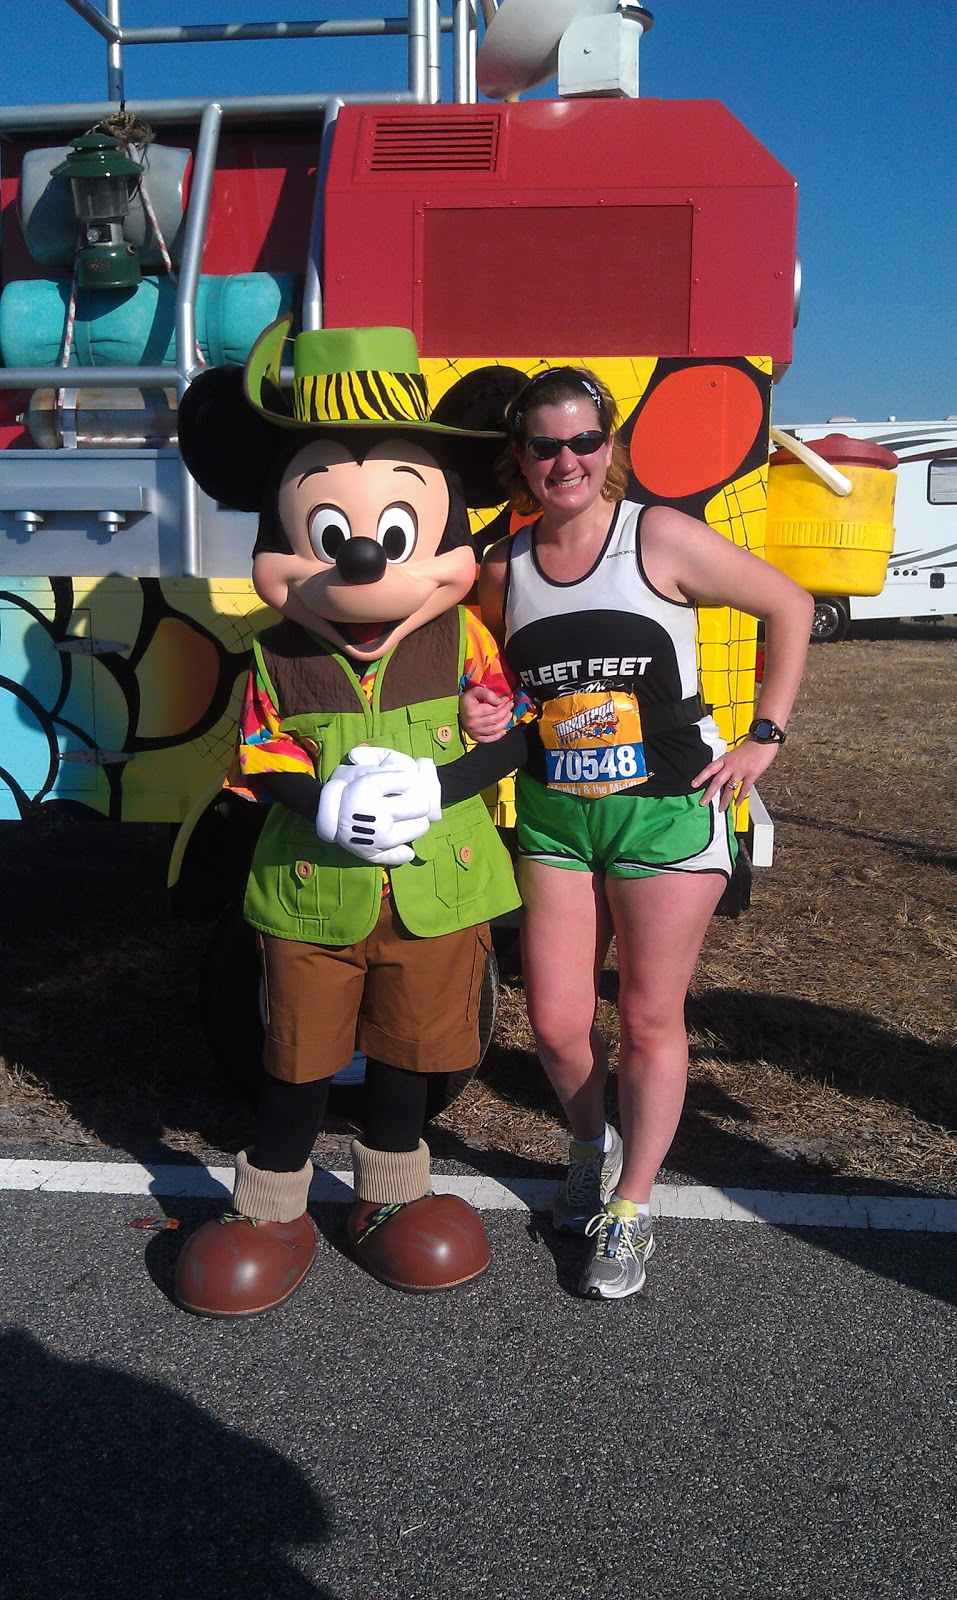 Walt disney marathon relay 2012